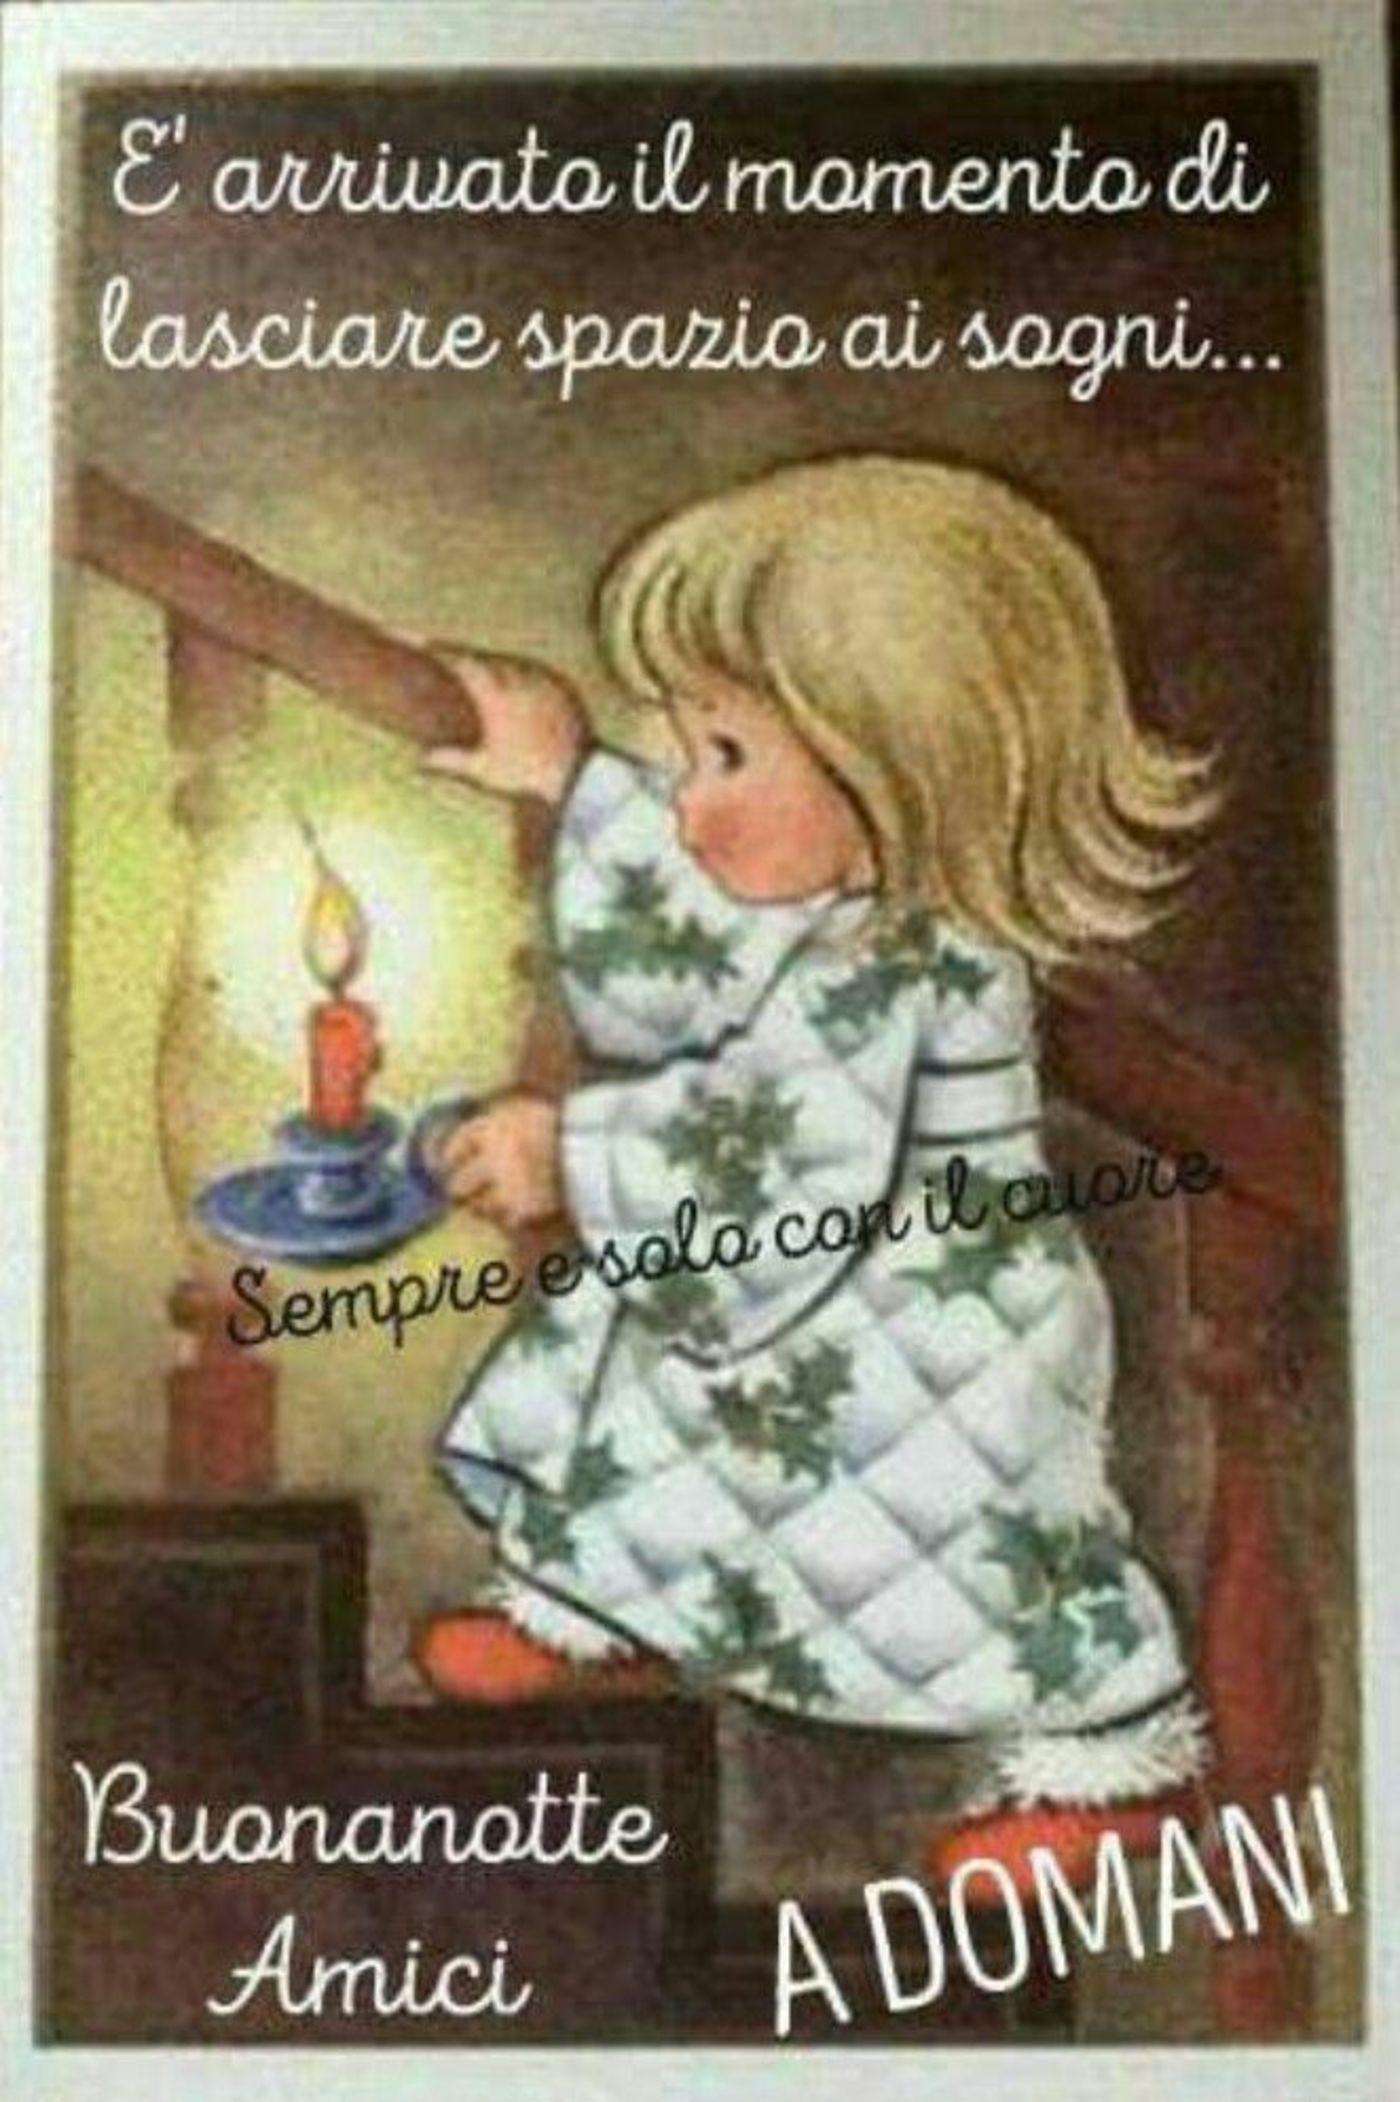 Buonanotte Frasi E Immagini Bellissime 905